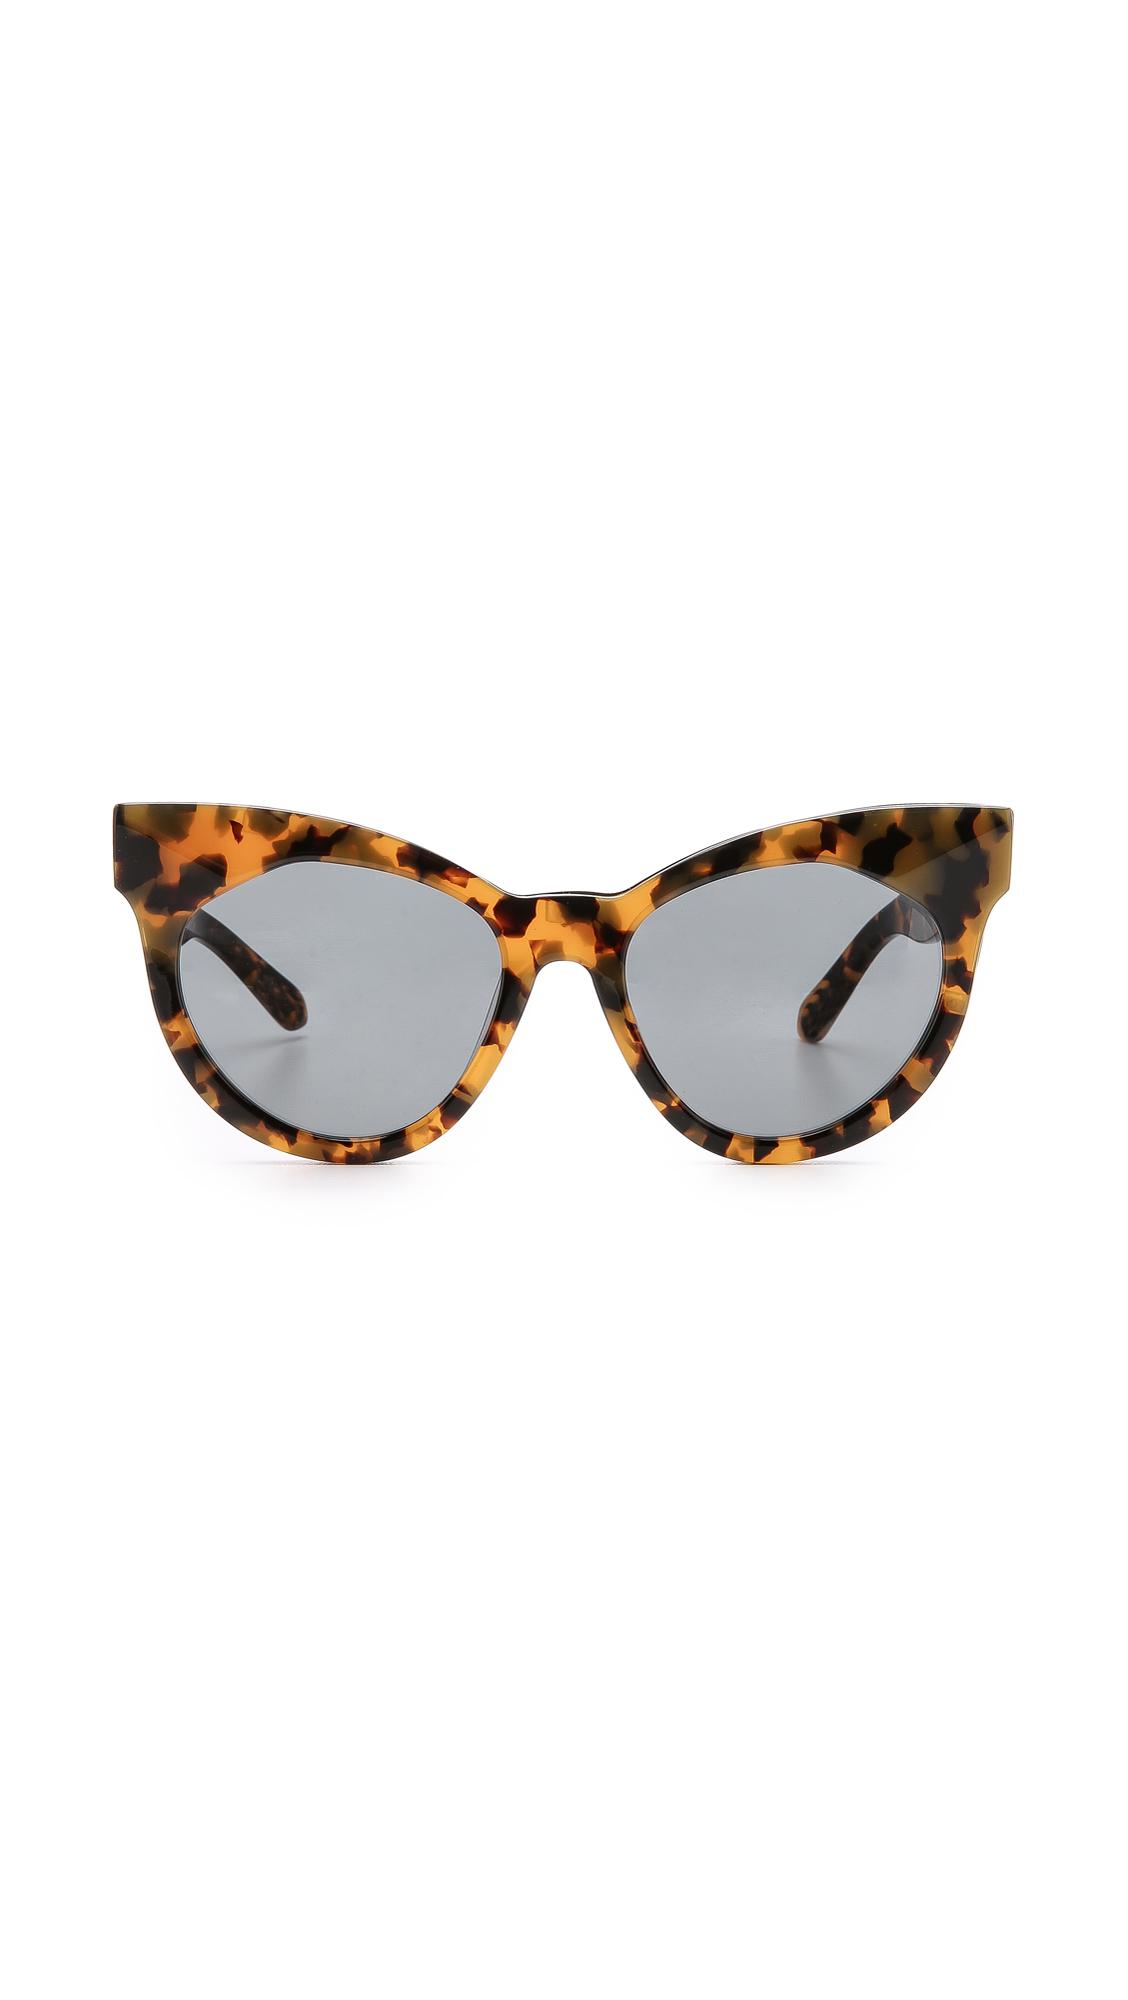 47efe46ec20 Karen Walker Starburst Sunglasses